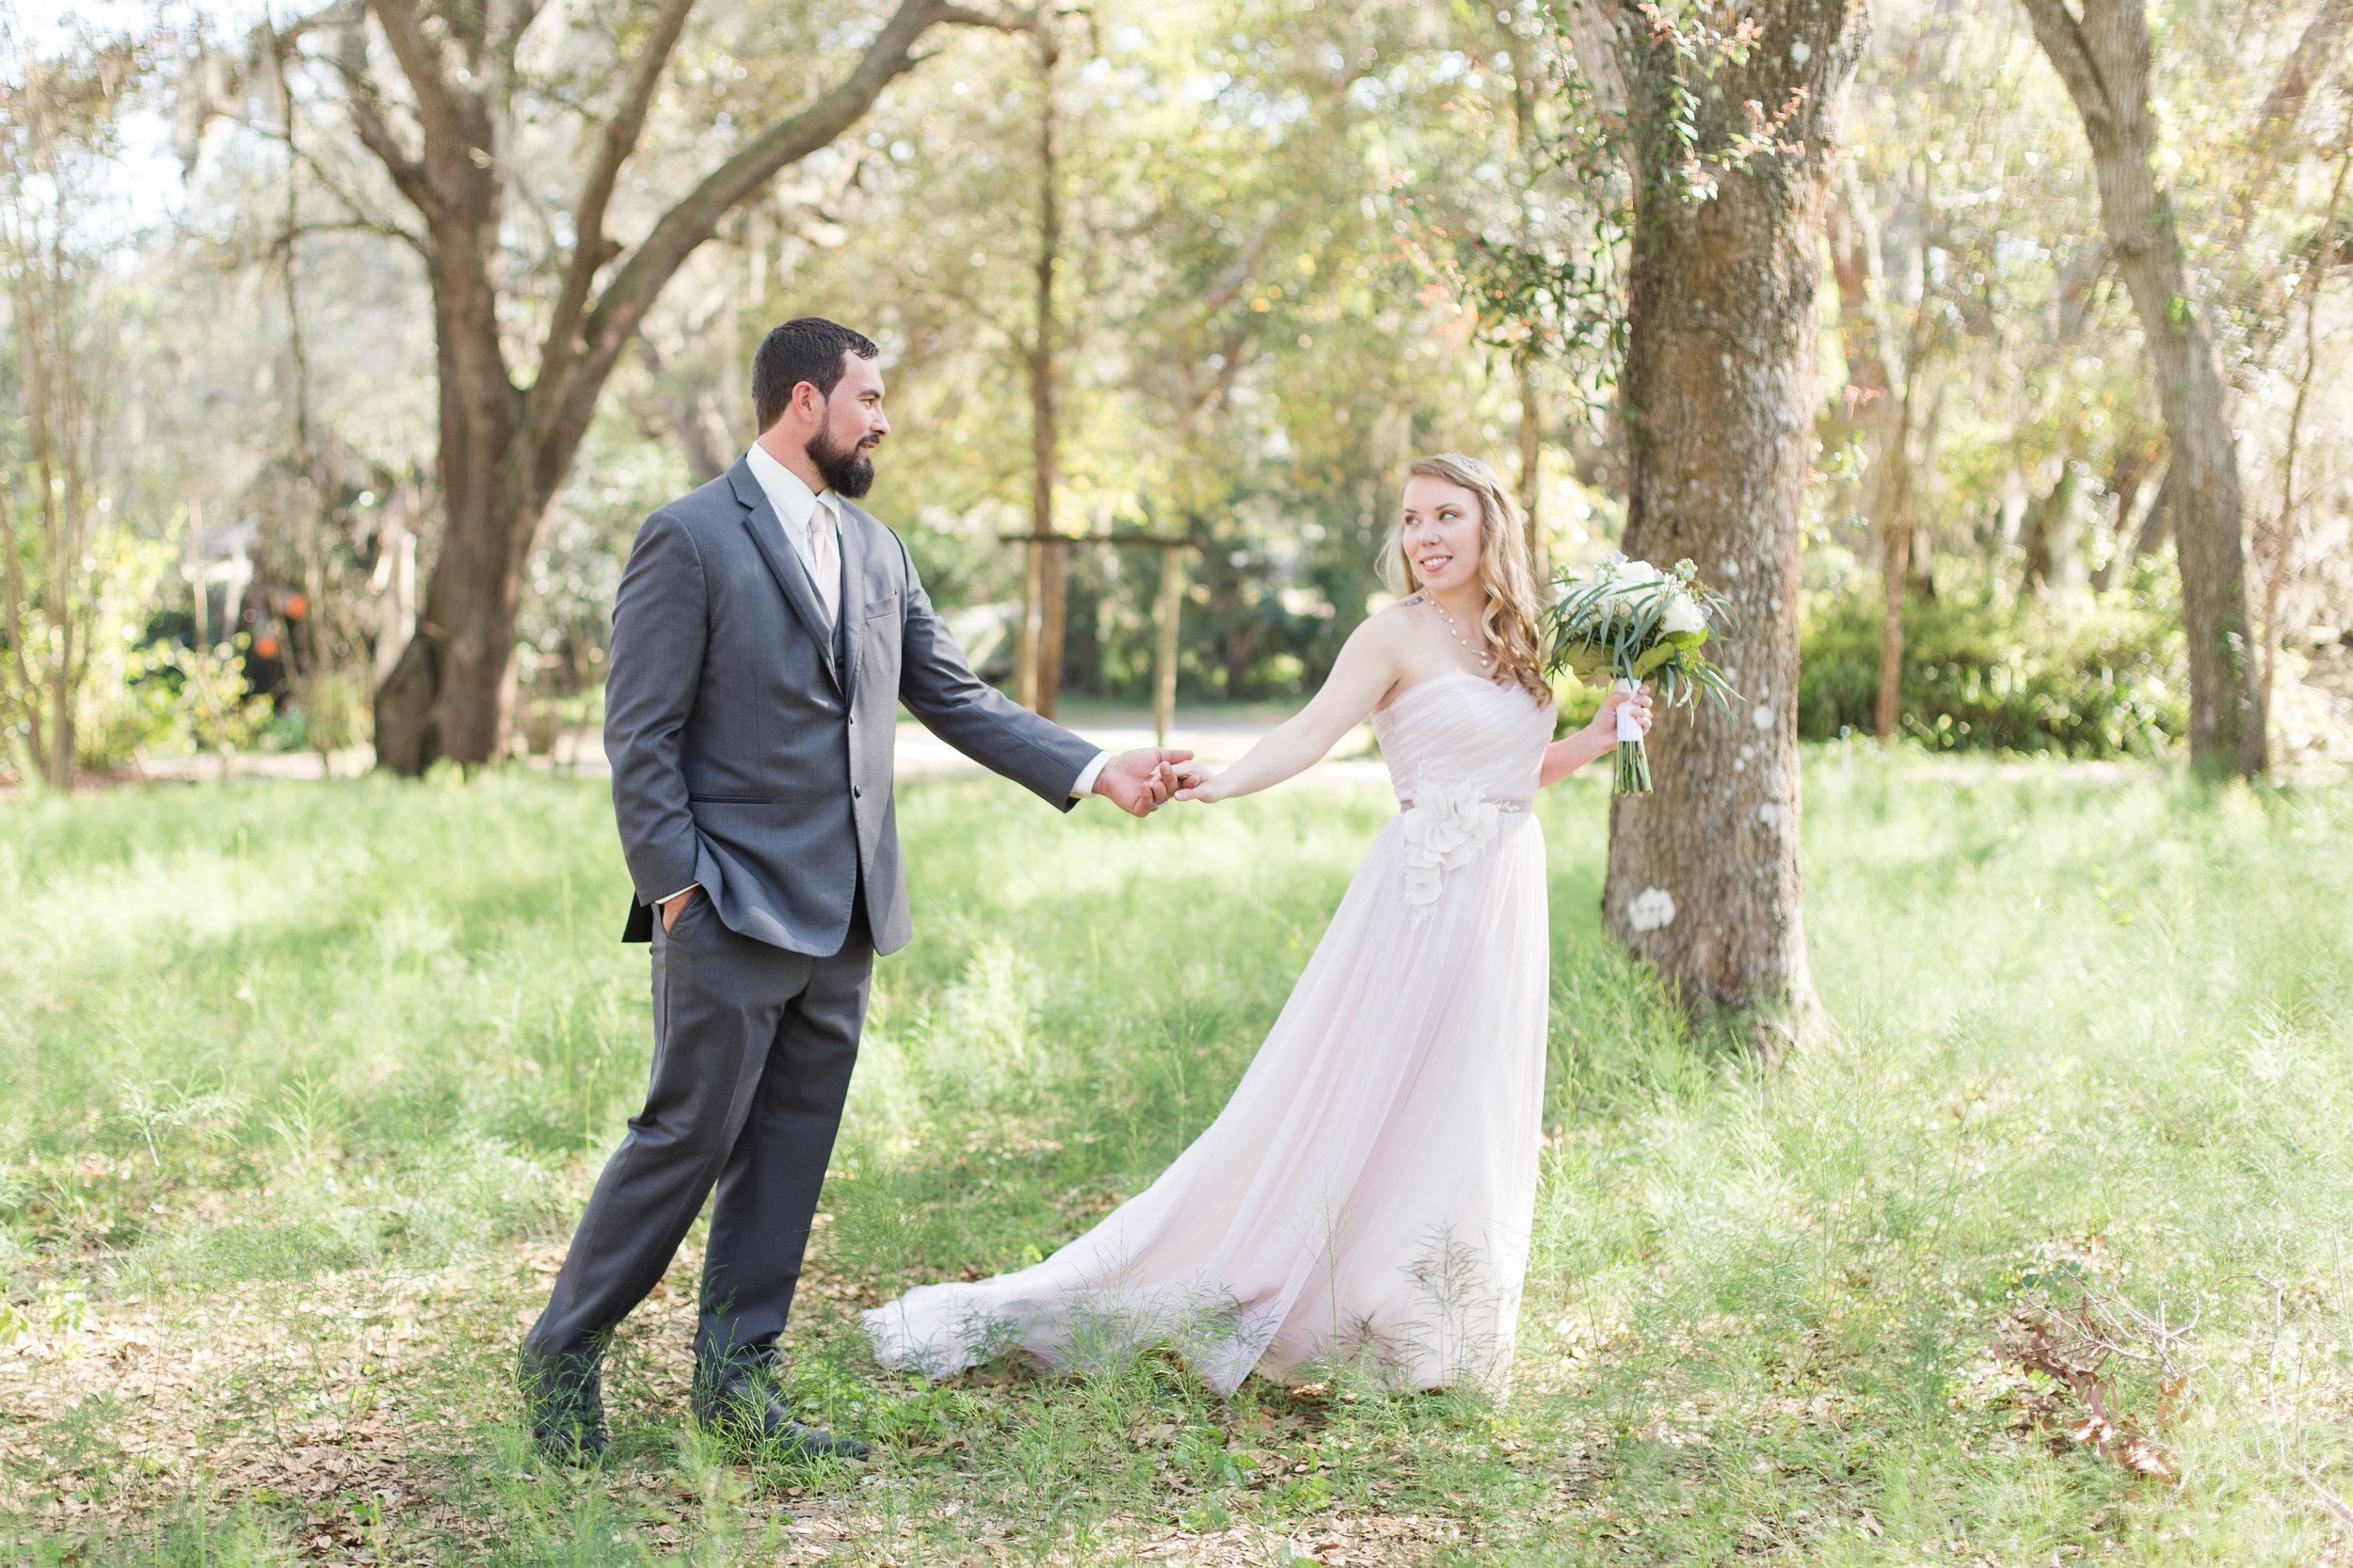 WeddingPortfolio-49.jpg